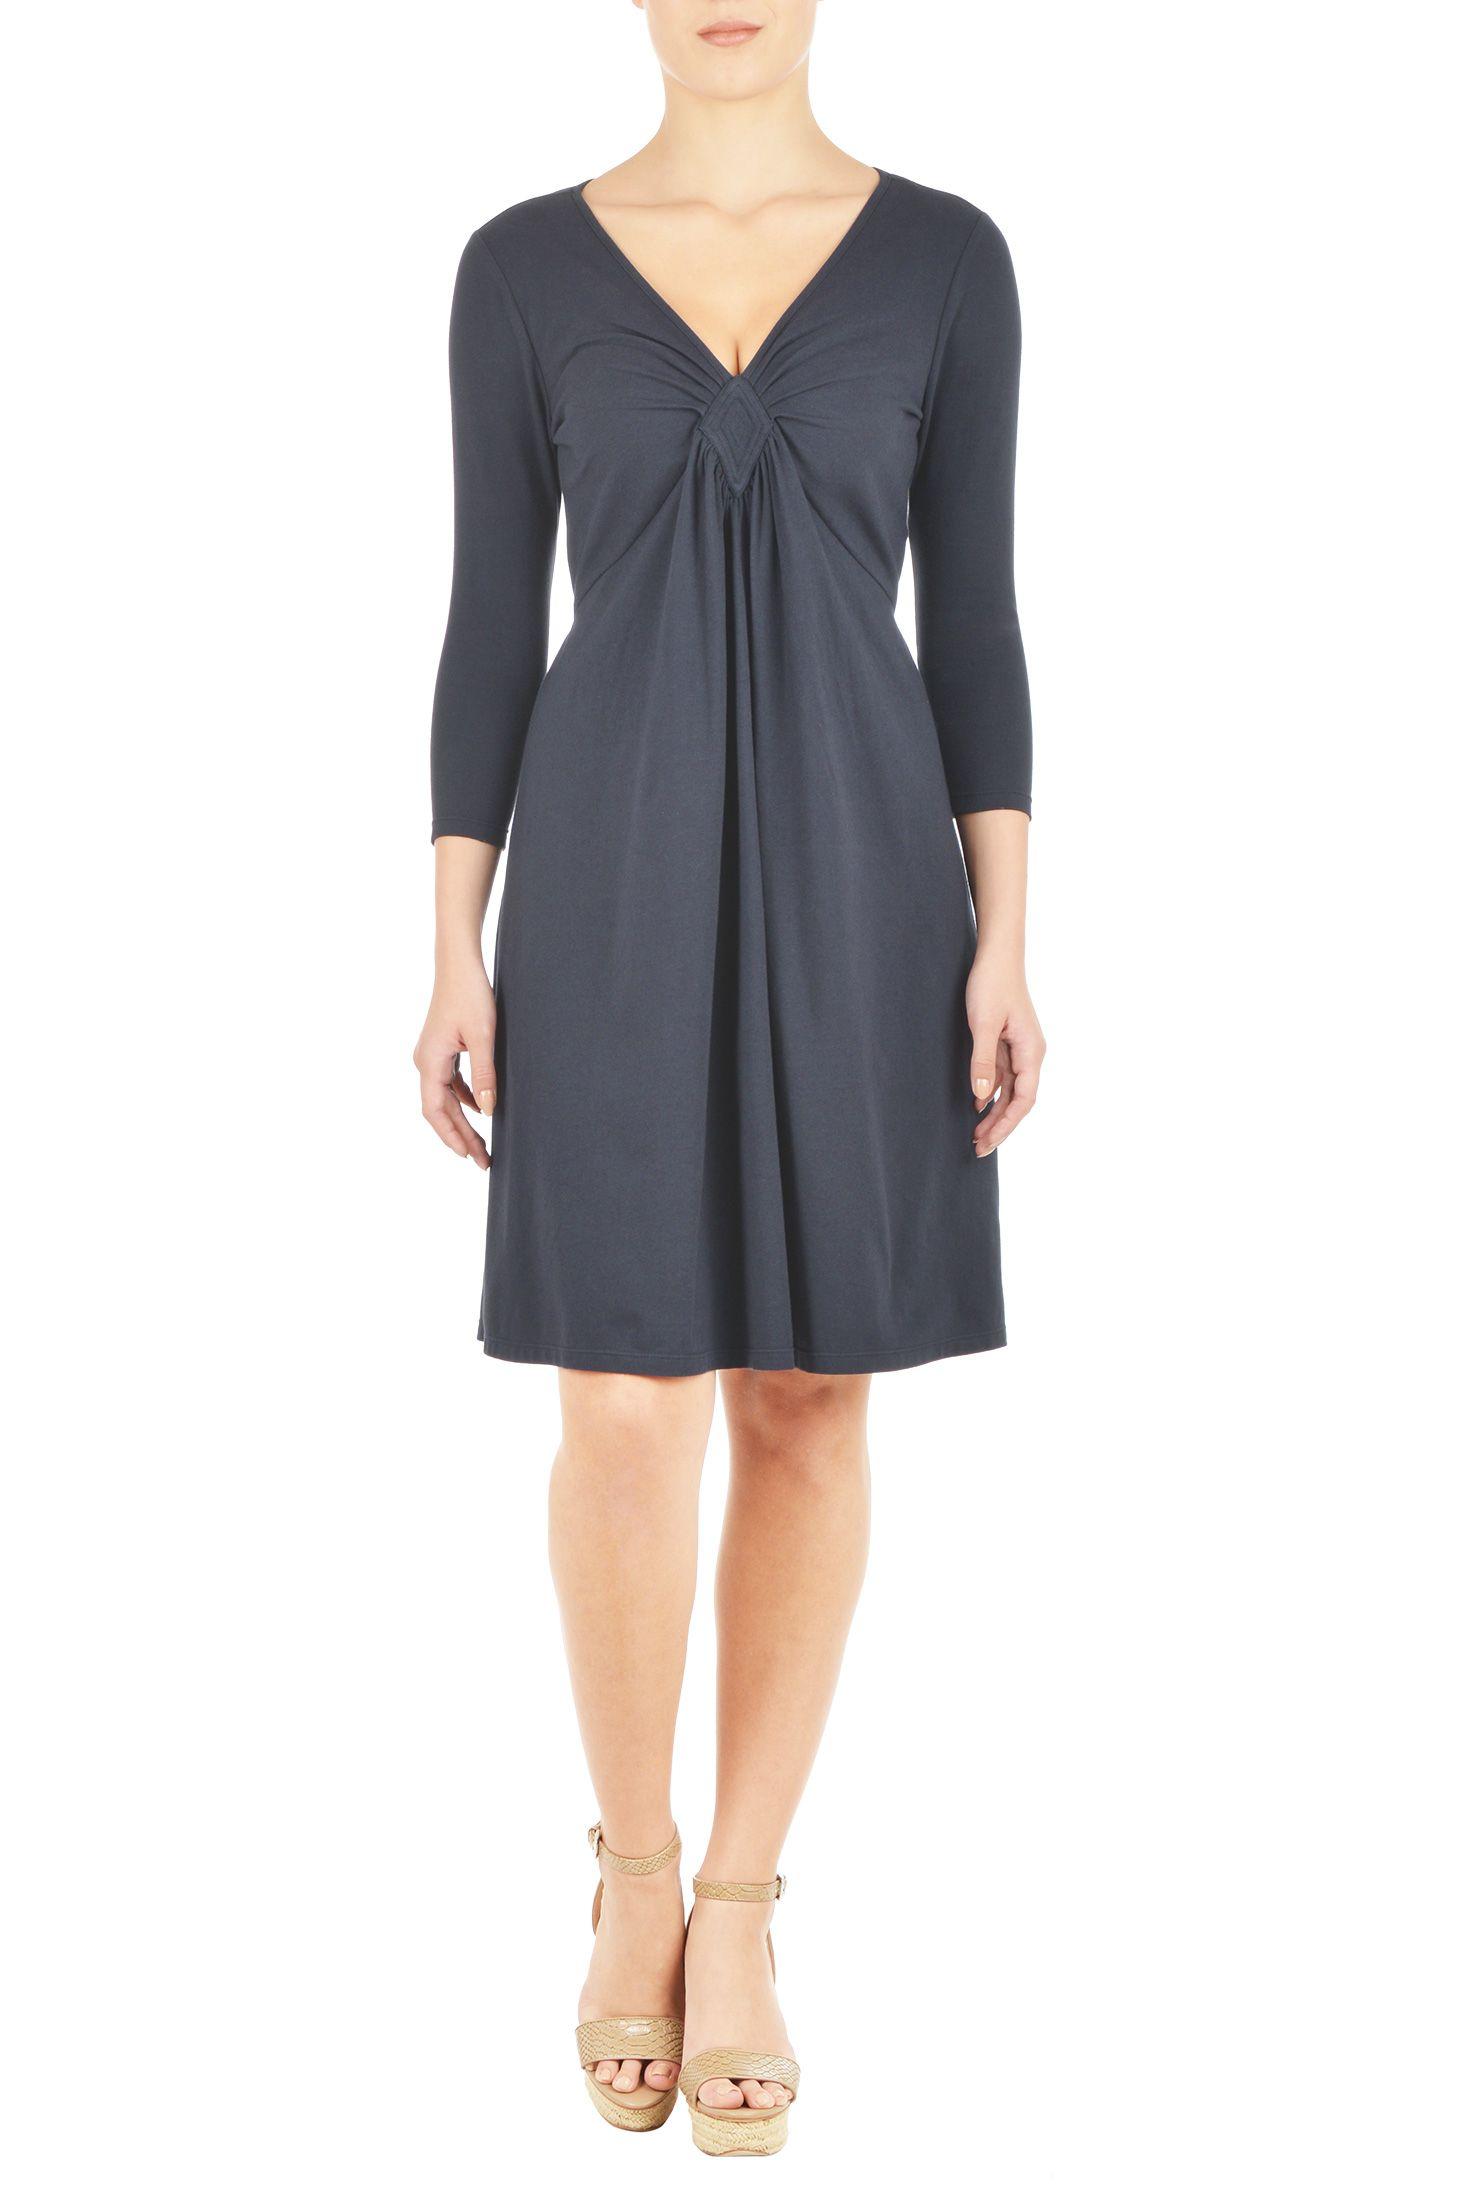 2e62e4c94a1 Women's Fashion Clothing 0-36W and Custom   Fash   Dresses, Knit ...